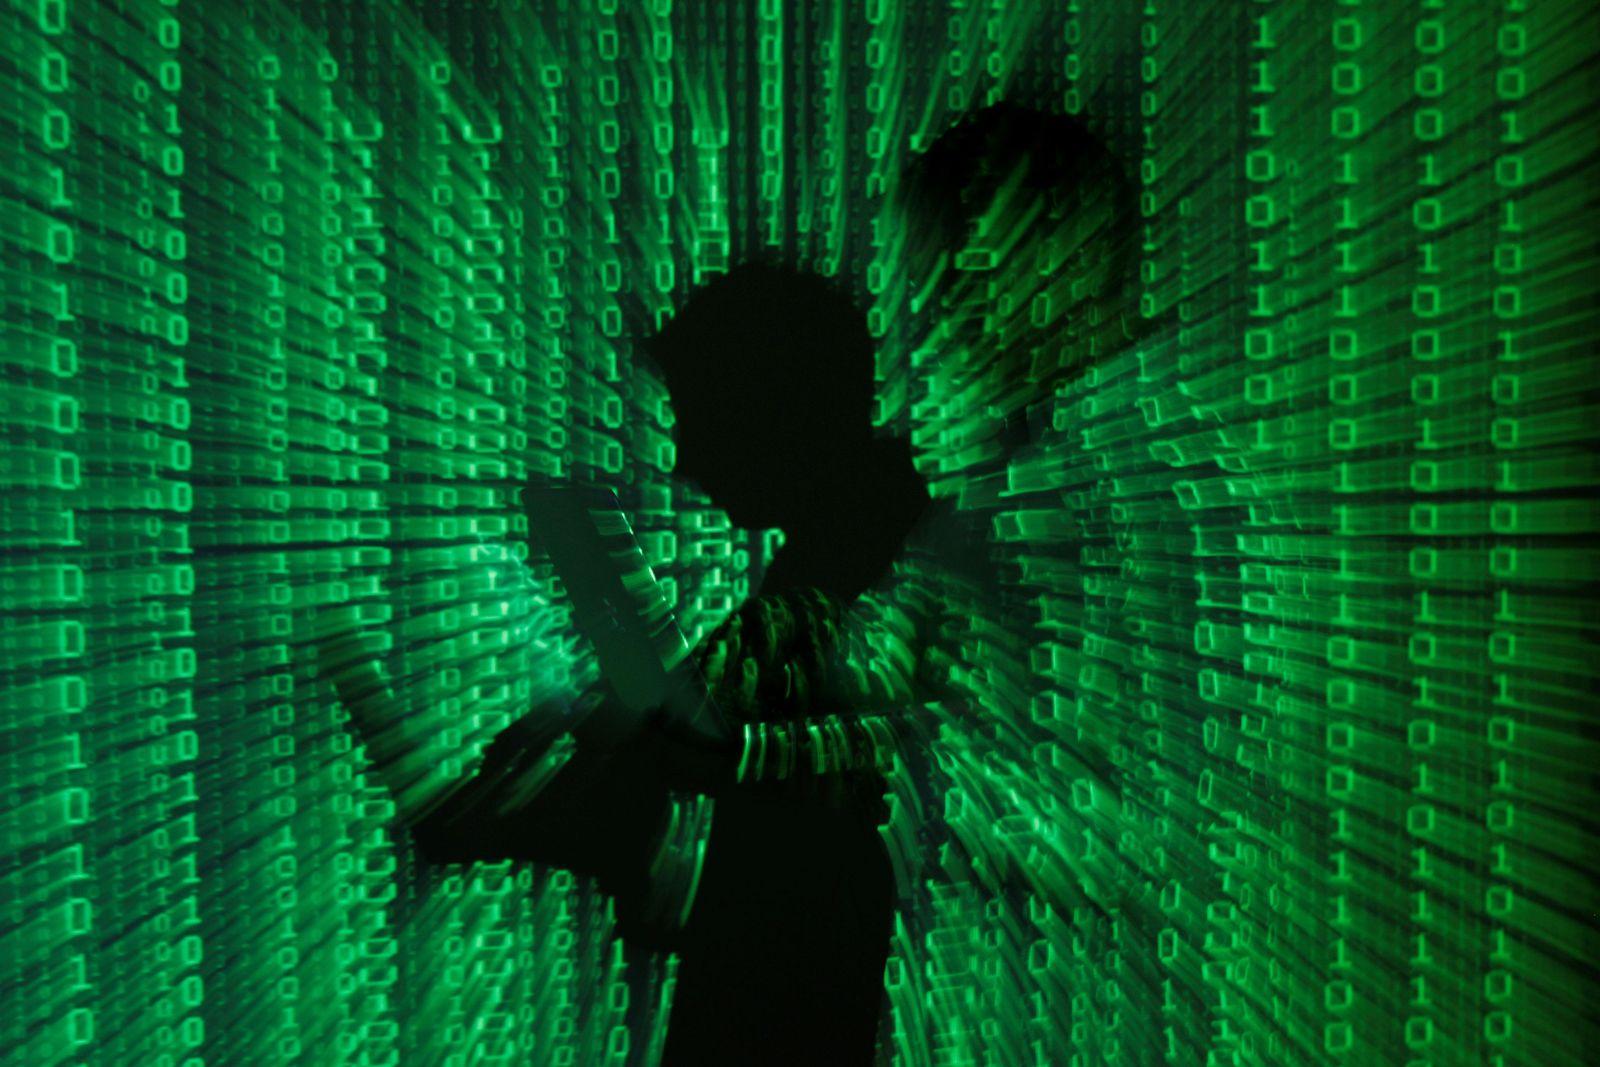 Cyberwar / Hacking / Laptop